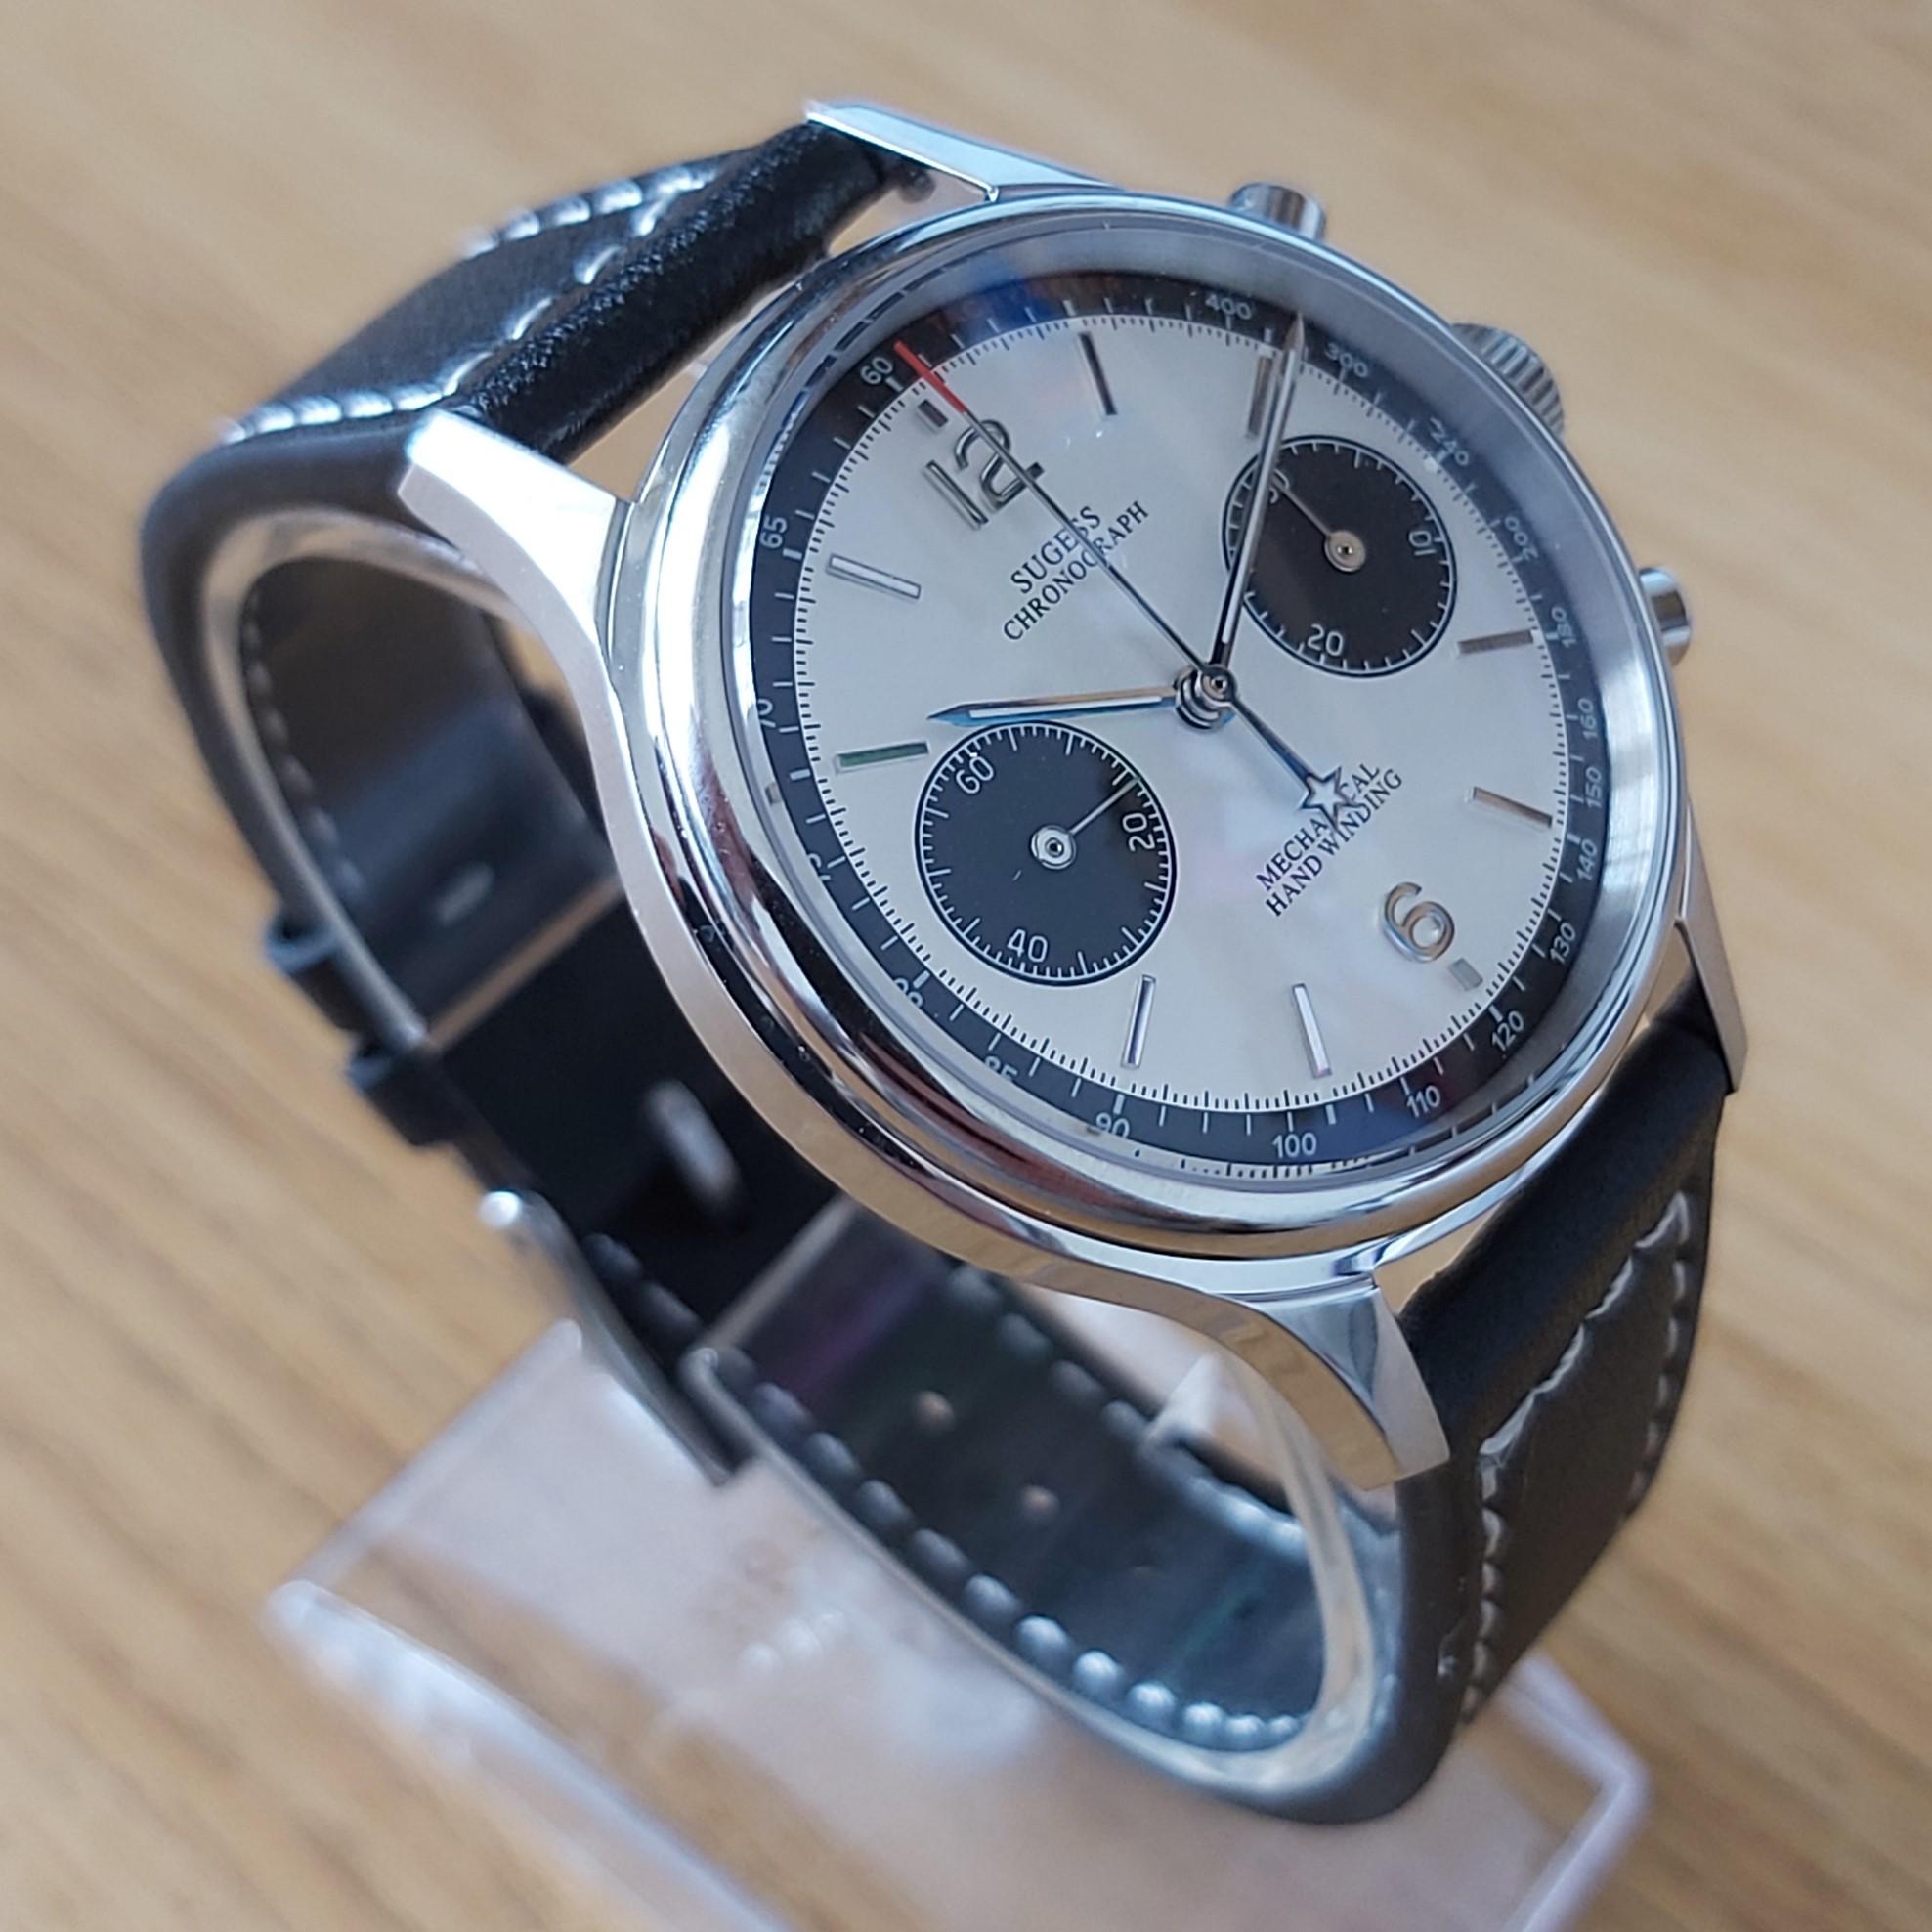 Sugess Chrono Heritage SUPAN001SN: White & Silver 38mm